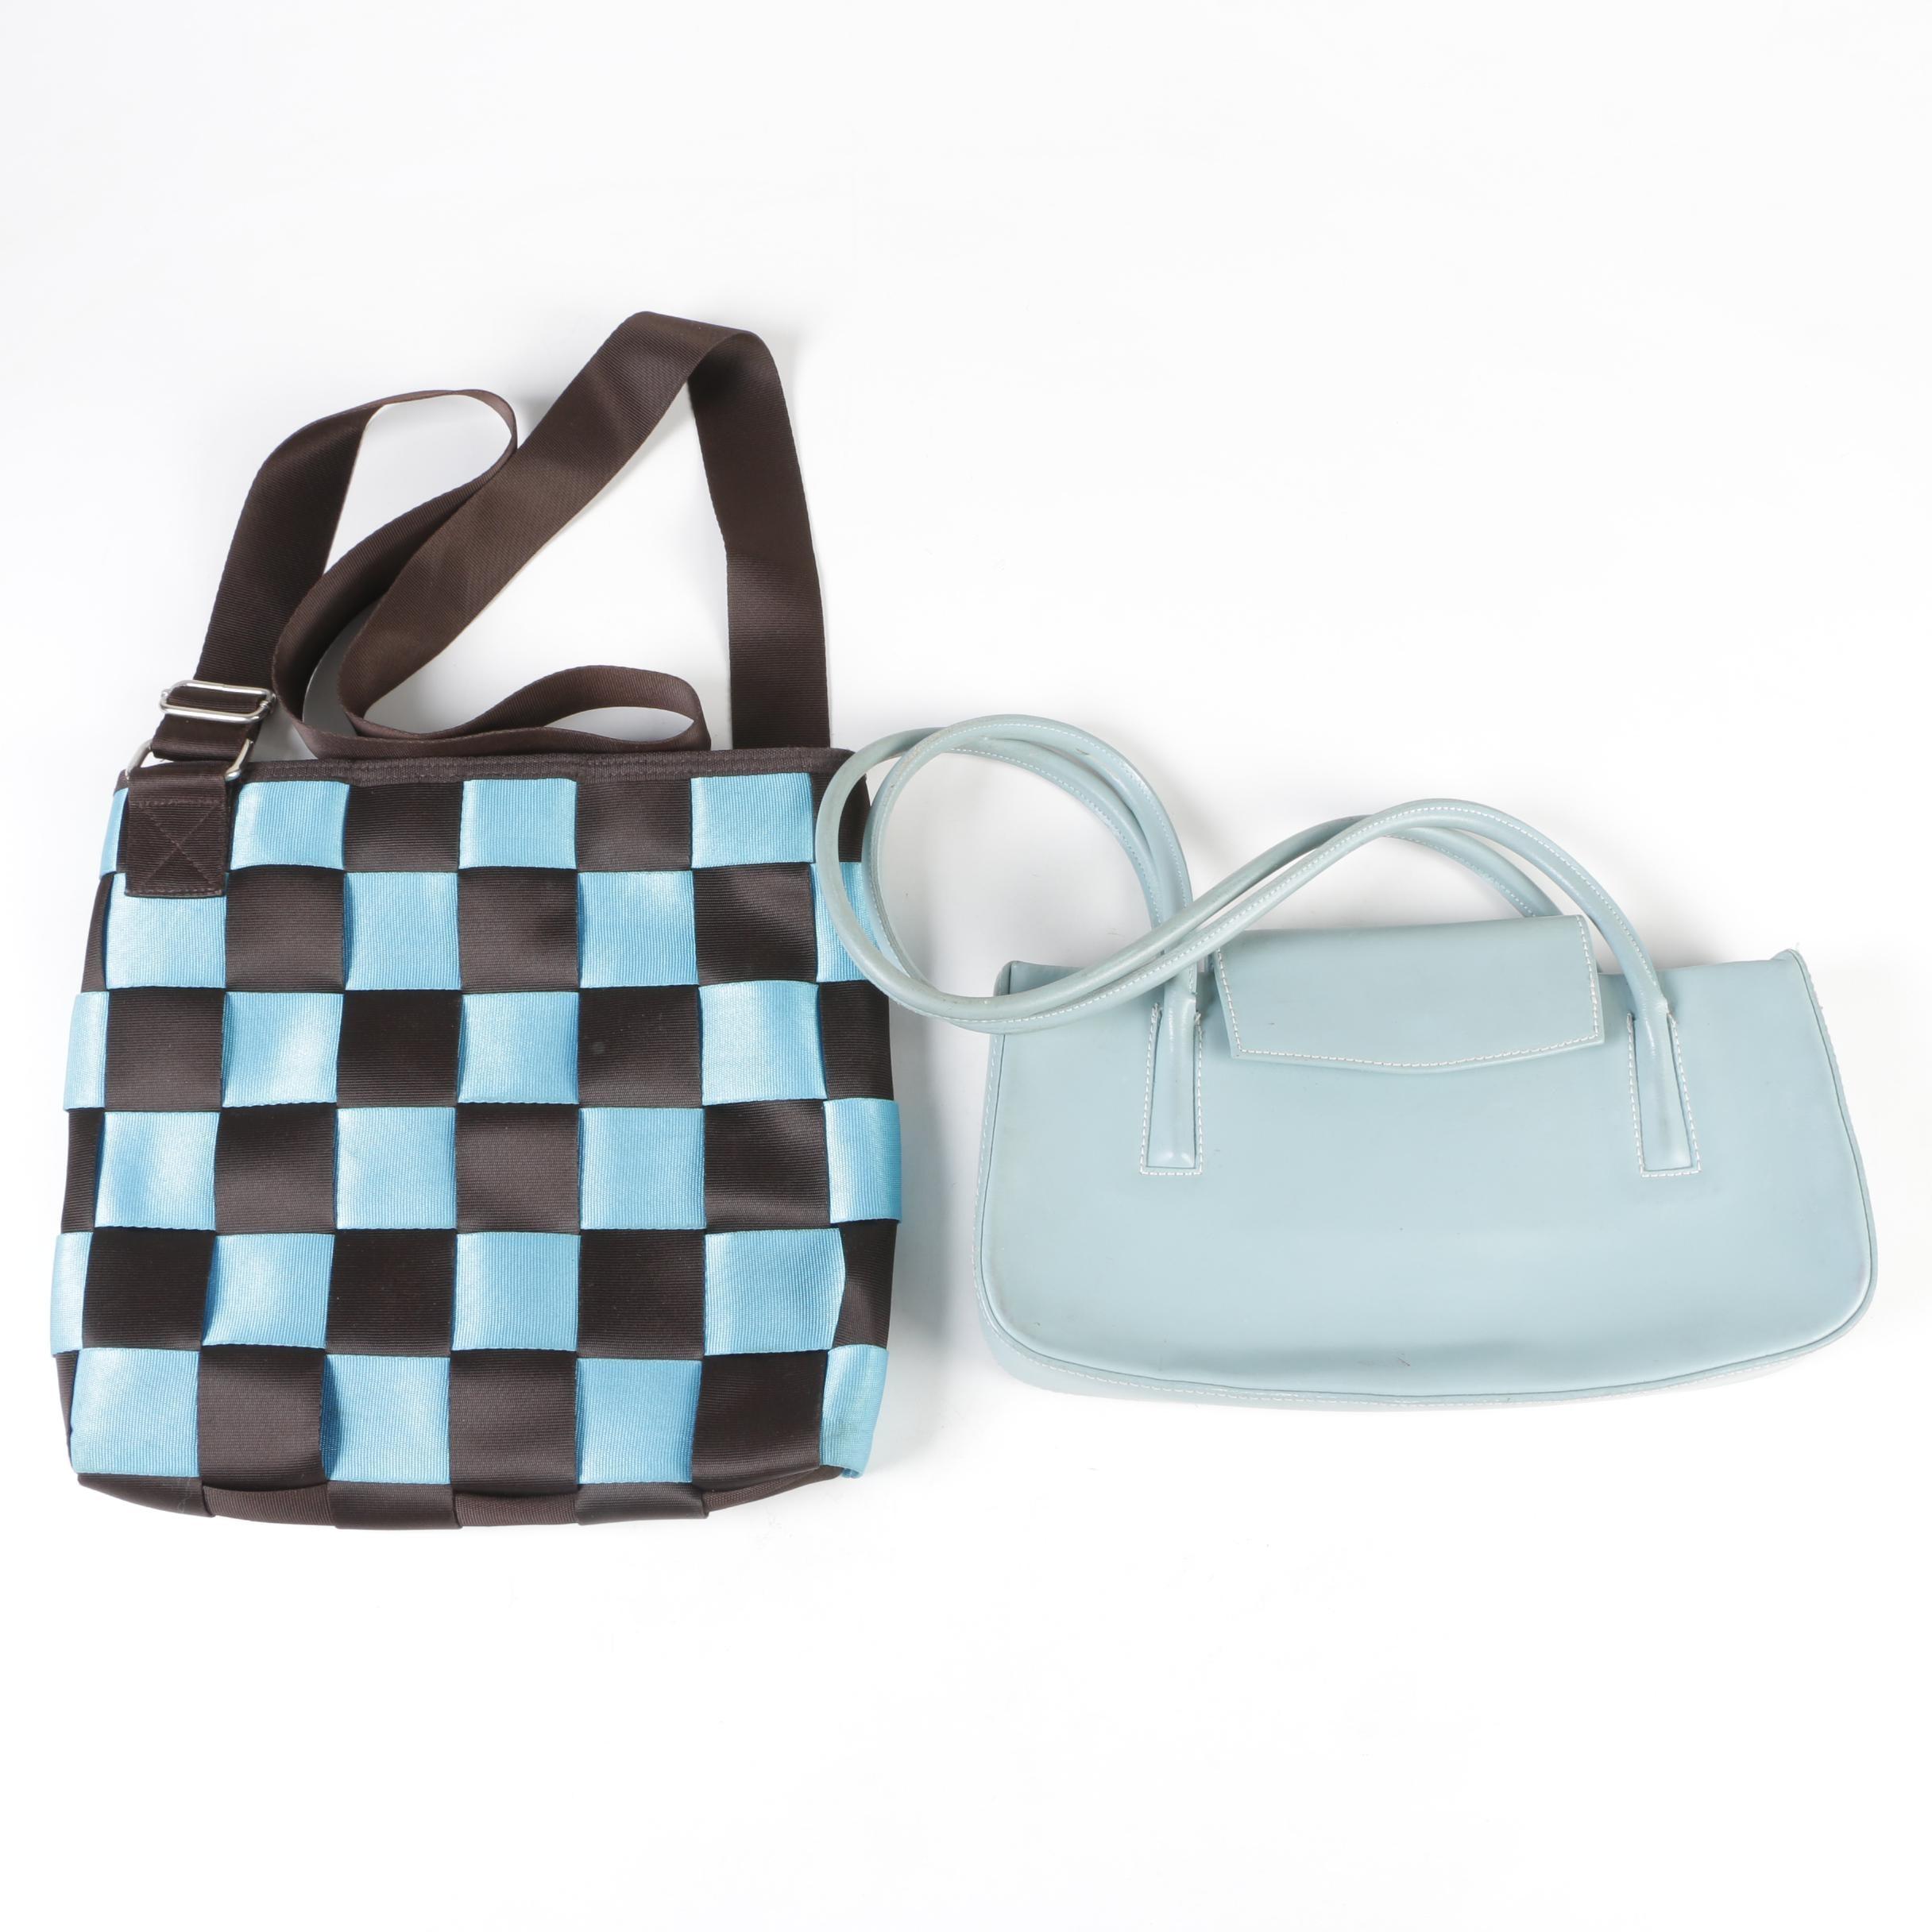 Seat Belt Style Nylon Crossbody Bag with Leather Shoulder Bag